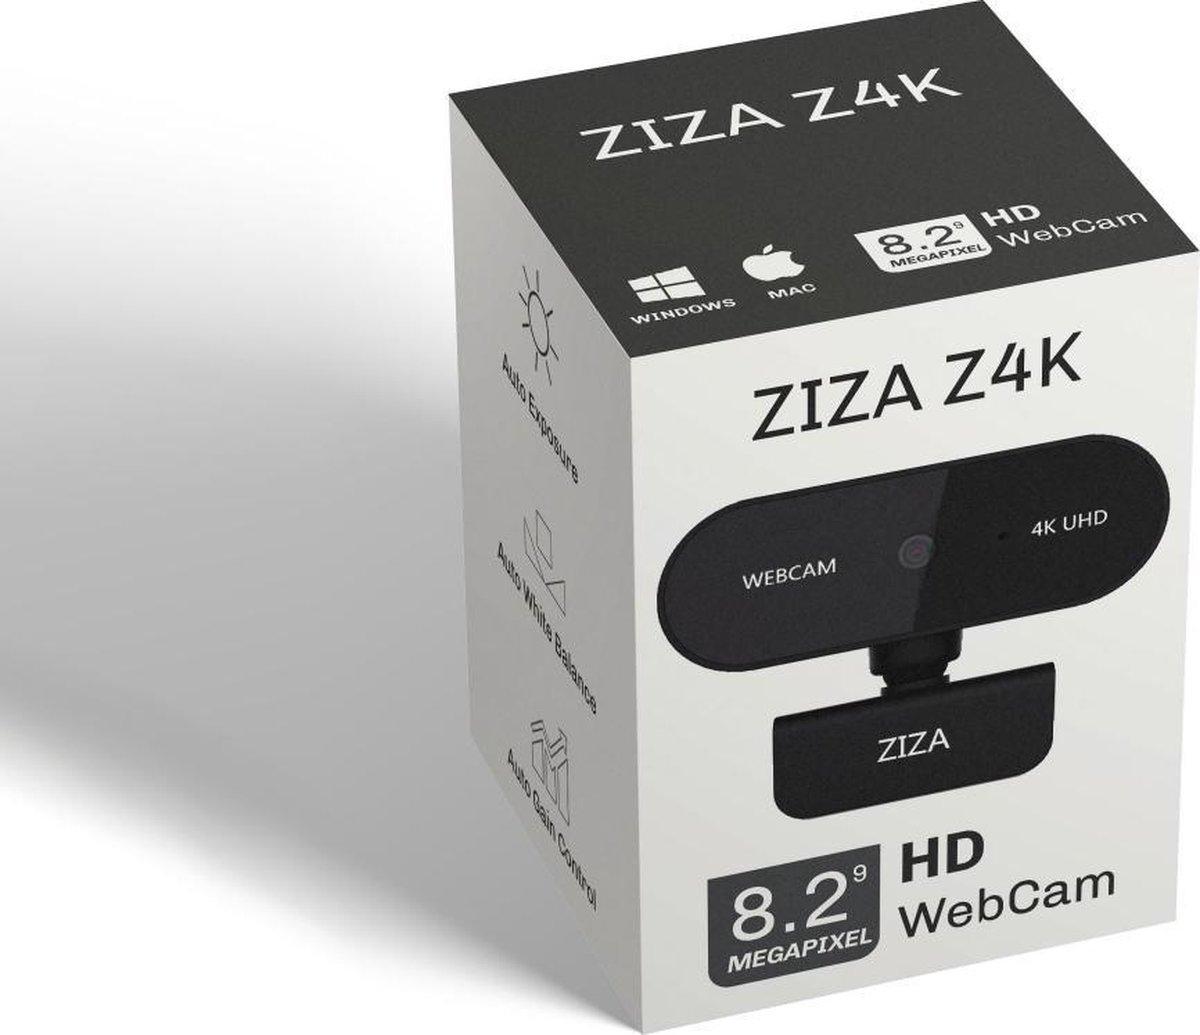 ZIZA Z4K webcam met microfoon | 4K Ultra HD | 3840 x 2160 | Autofocus | 8.29 MP